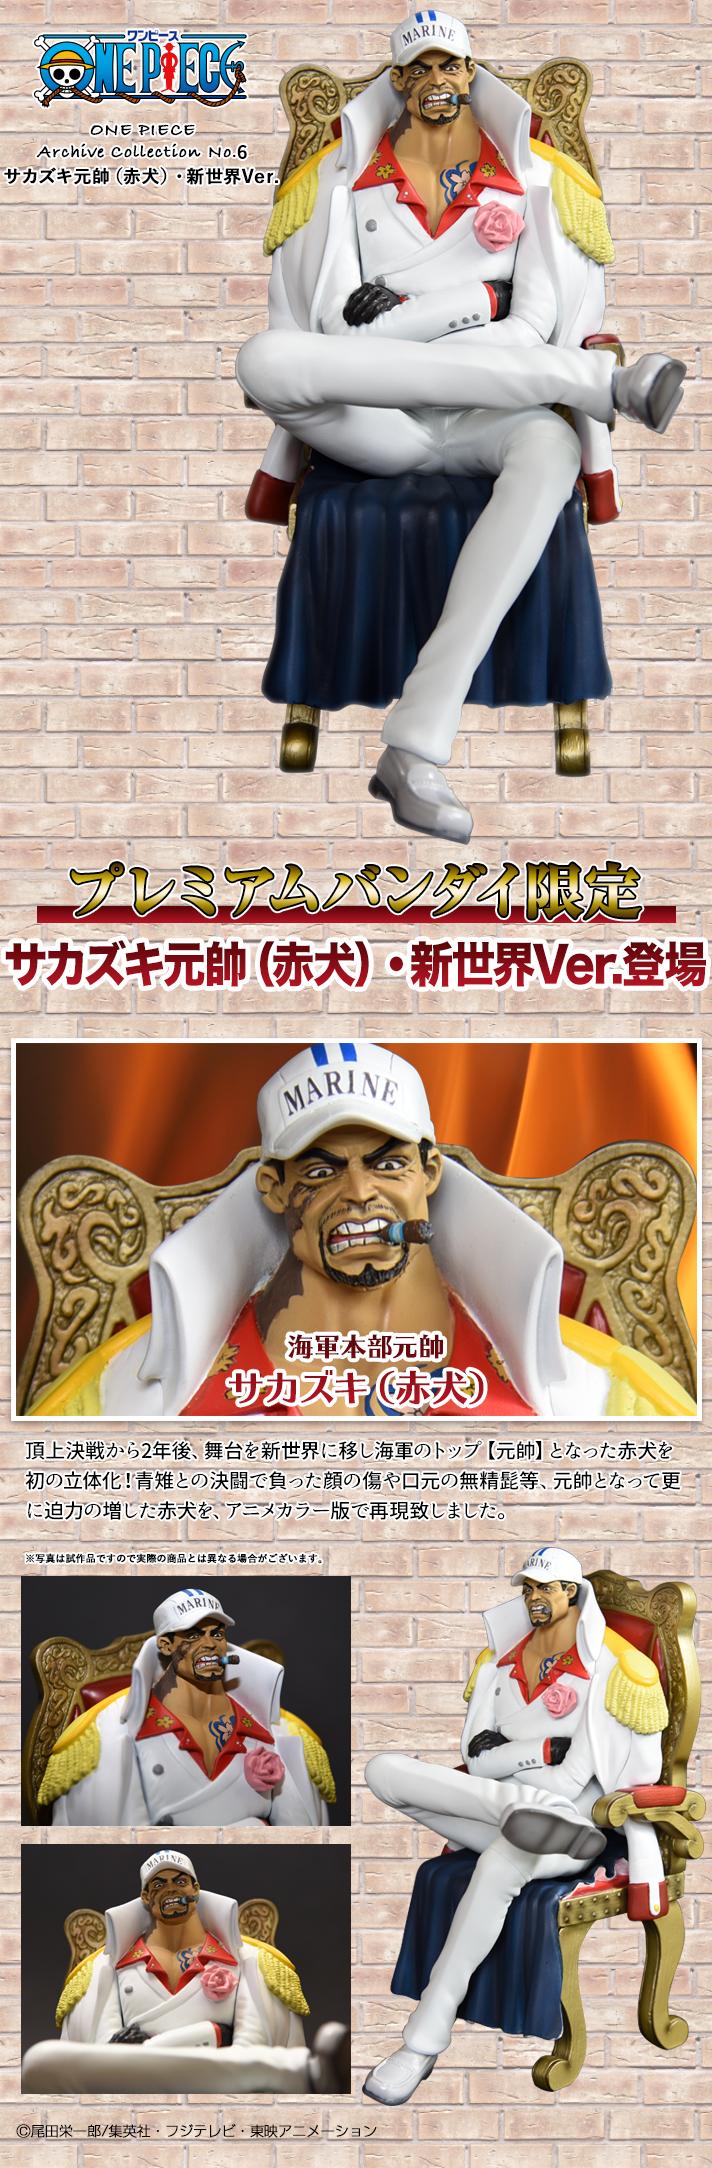 『ARCHIVE COLLECTIONS系列』 No.6《航海王》海軍元帥(赤犬)新世界Ver.【魂商店限定】